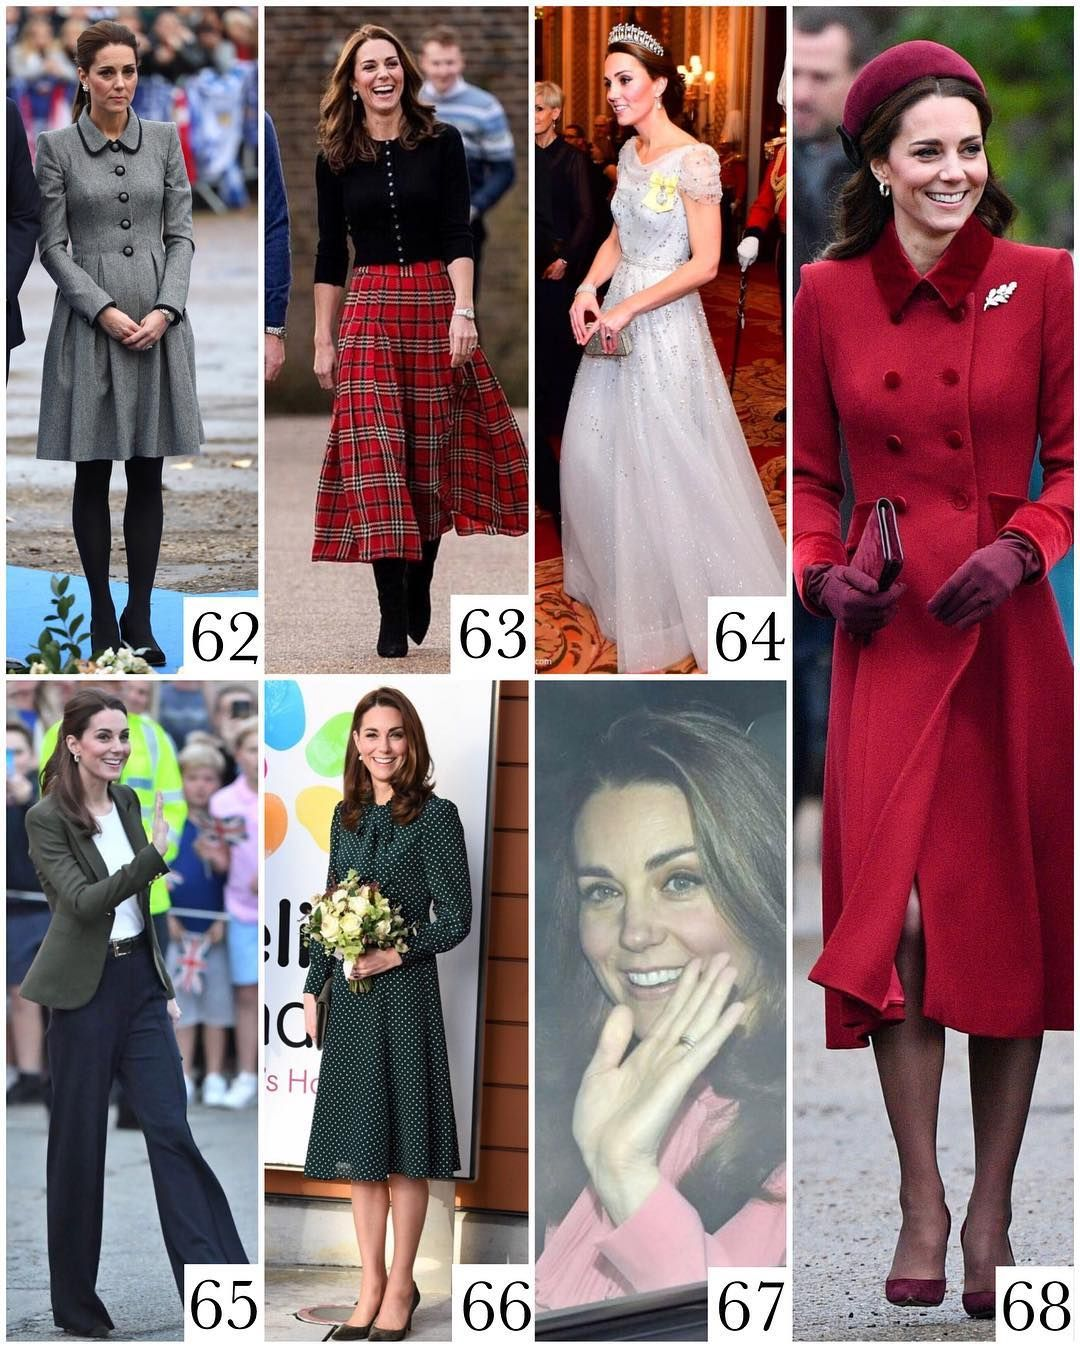 HRH The Duchess Of Cambridge (@katemidleton) • Instagram